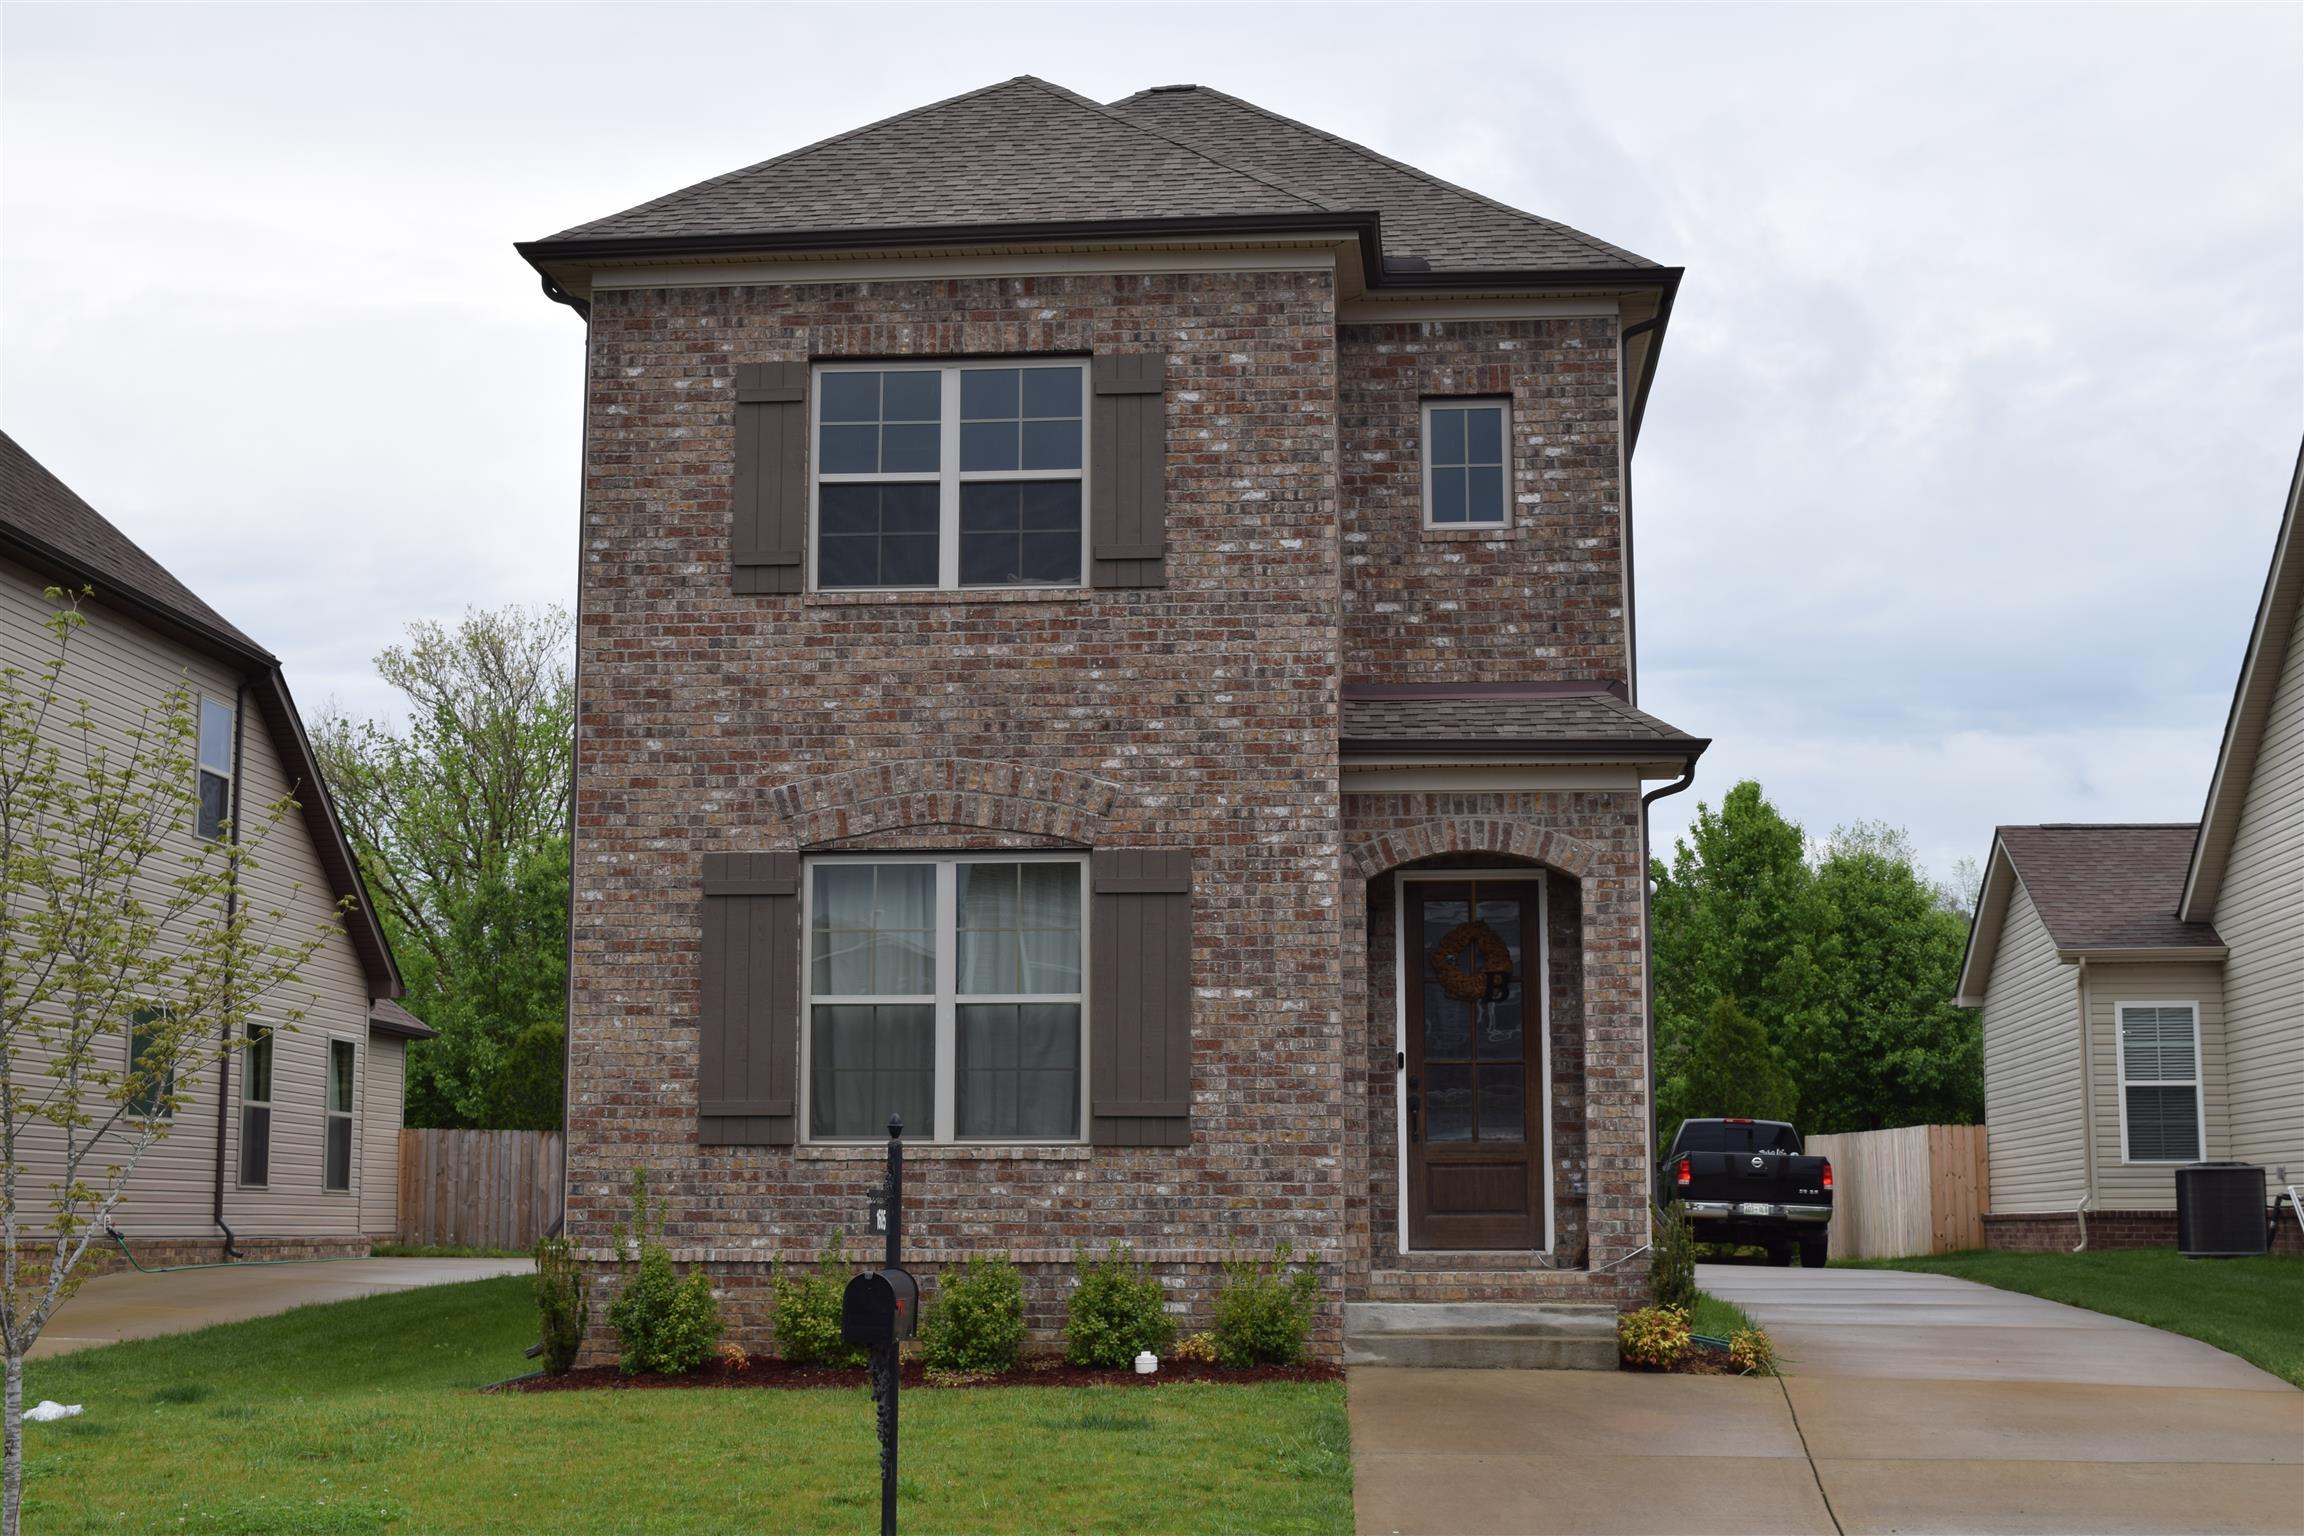 1605 Brockton Ln, Bellevue in Davidson County County, TN 37221 Home for Sale